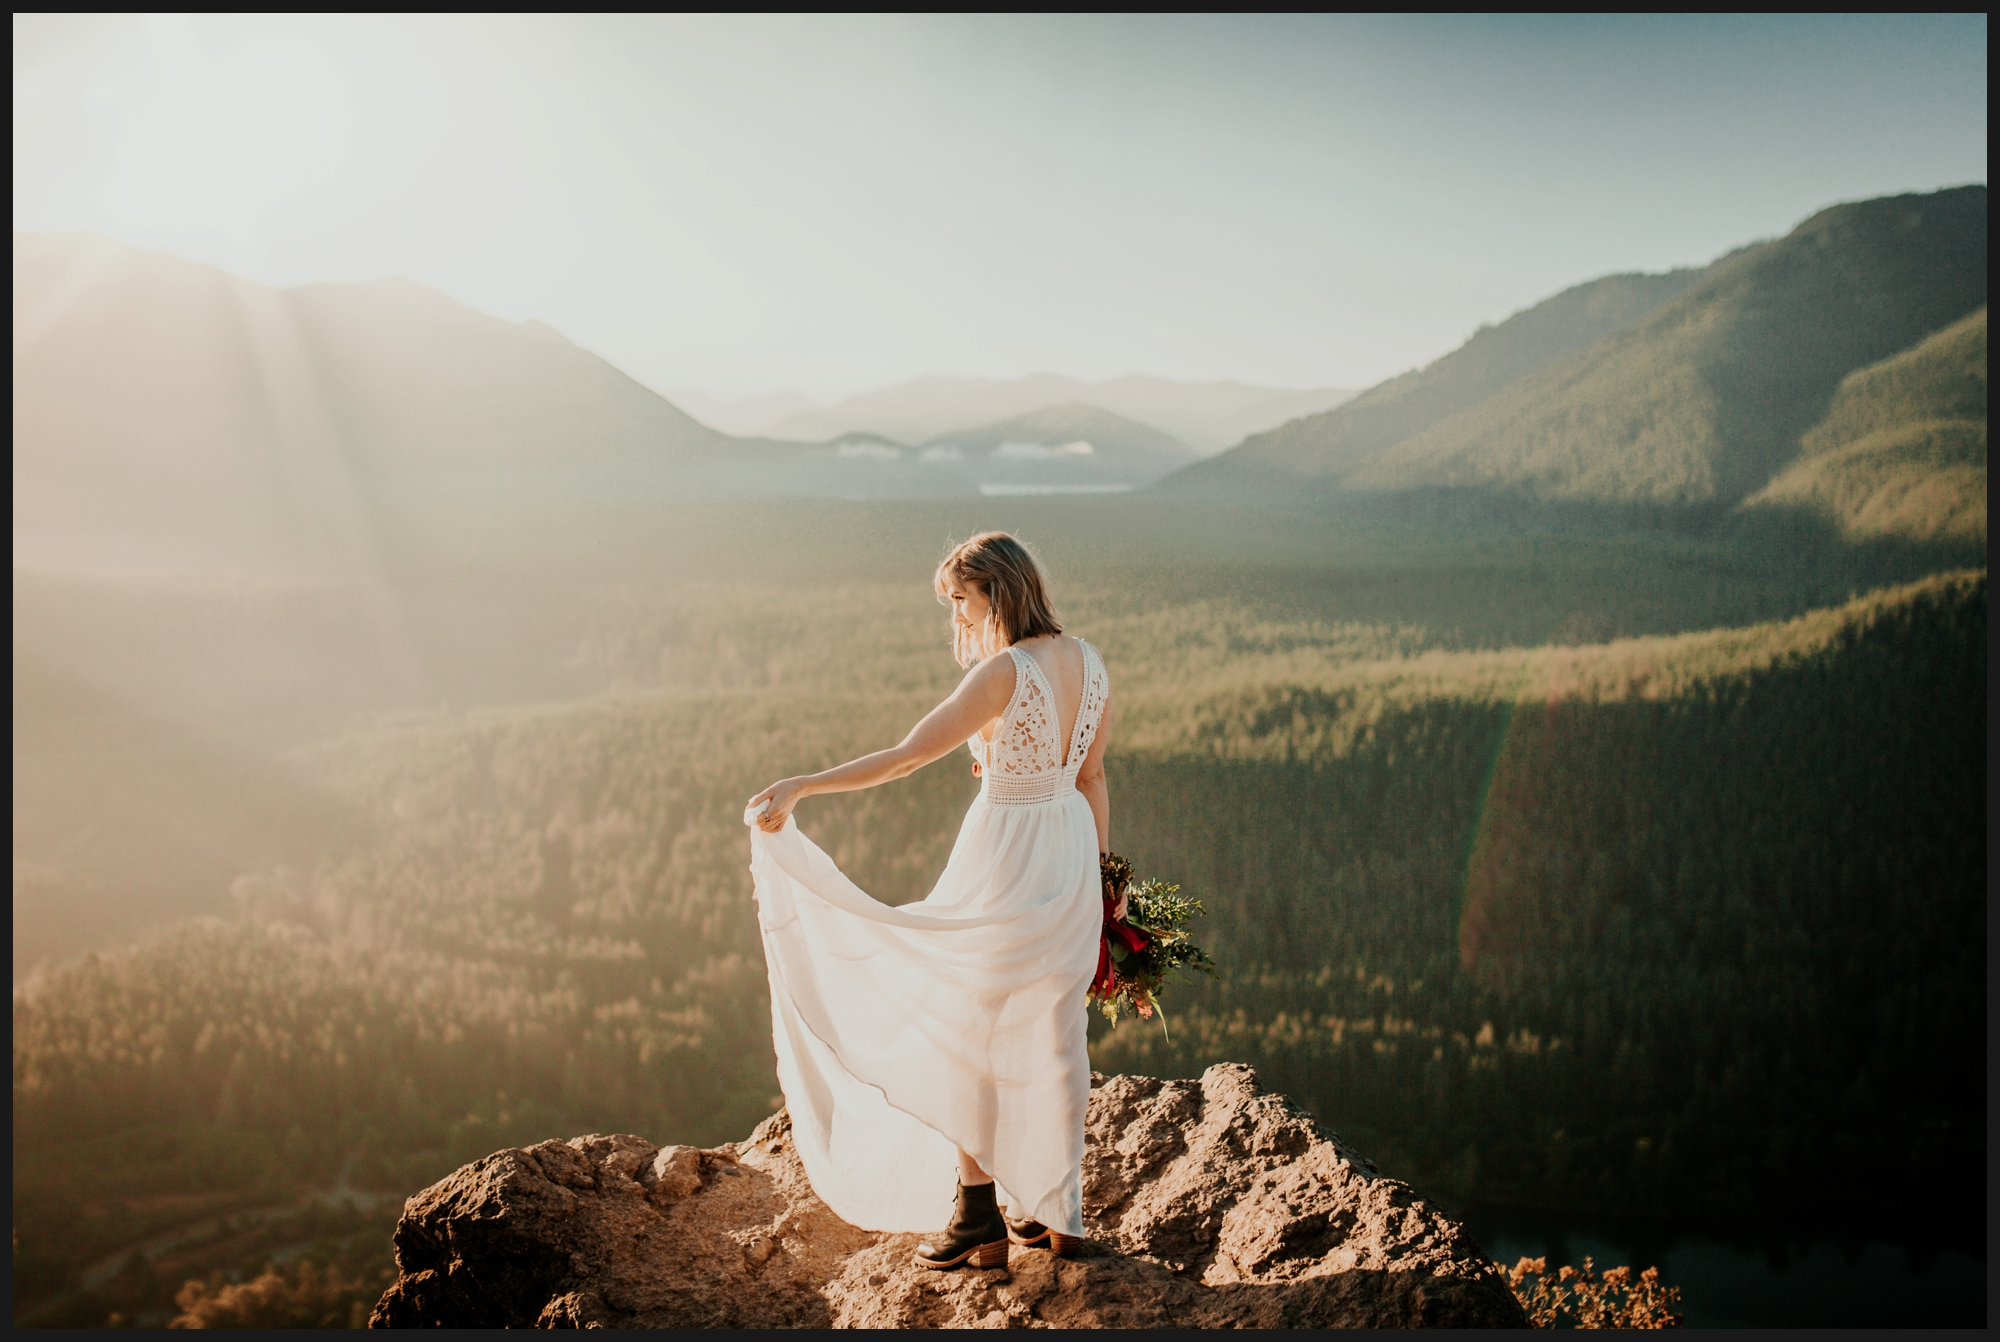 Orlando-Wedding-Photographer-destination-wedding-photographer-florida-wedding-photographer-bohemian-wedding-photographer_0433.jpg